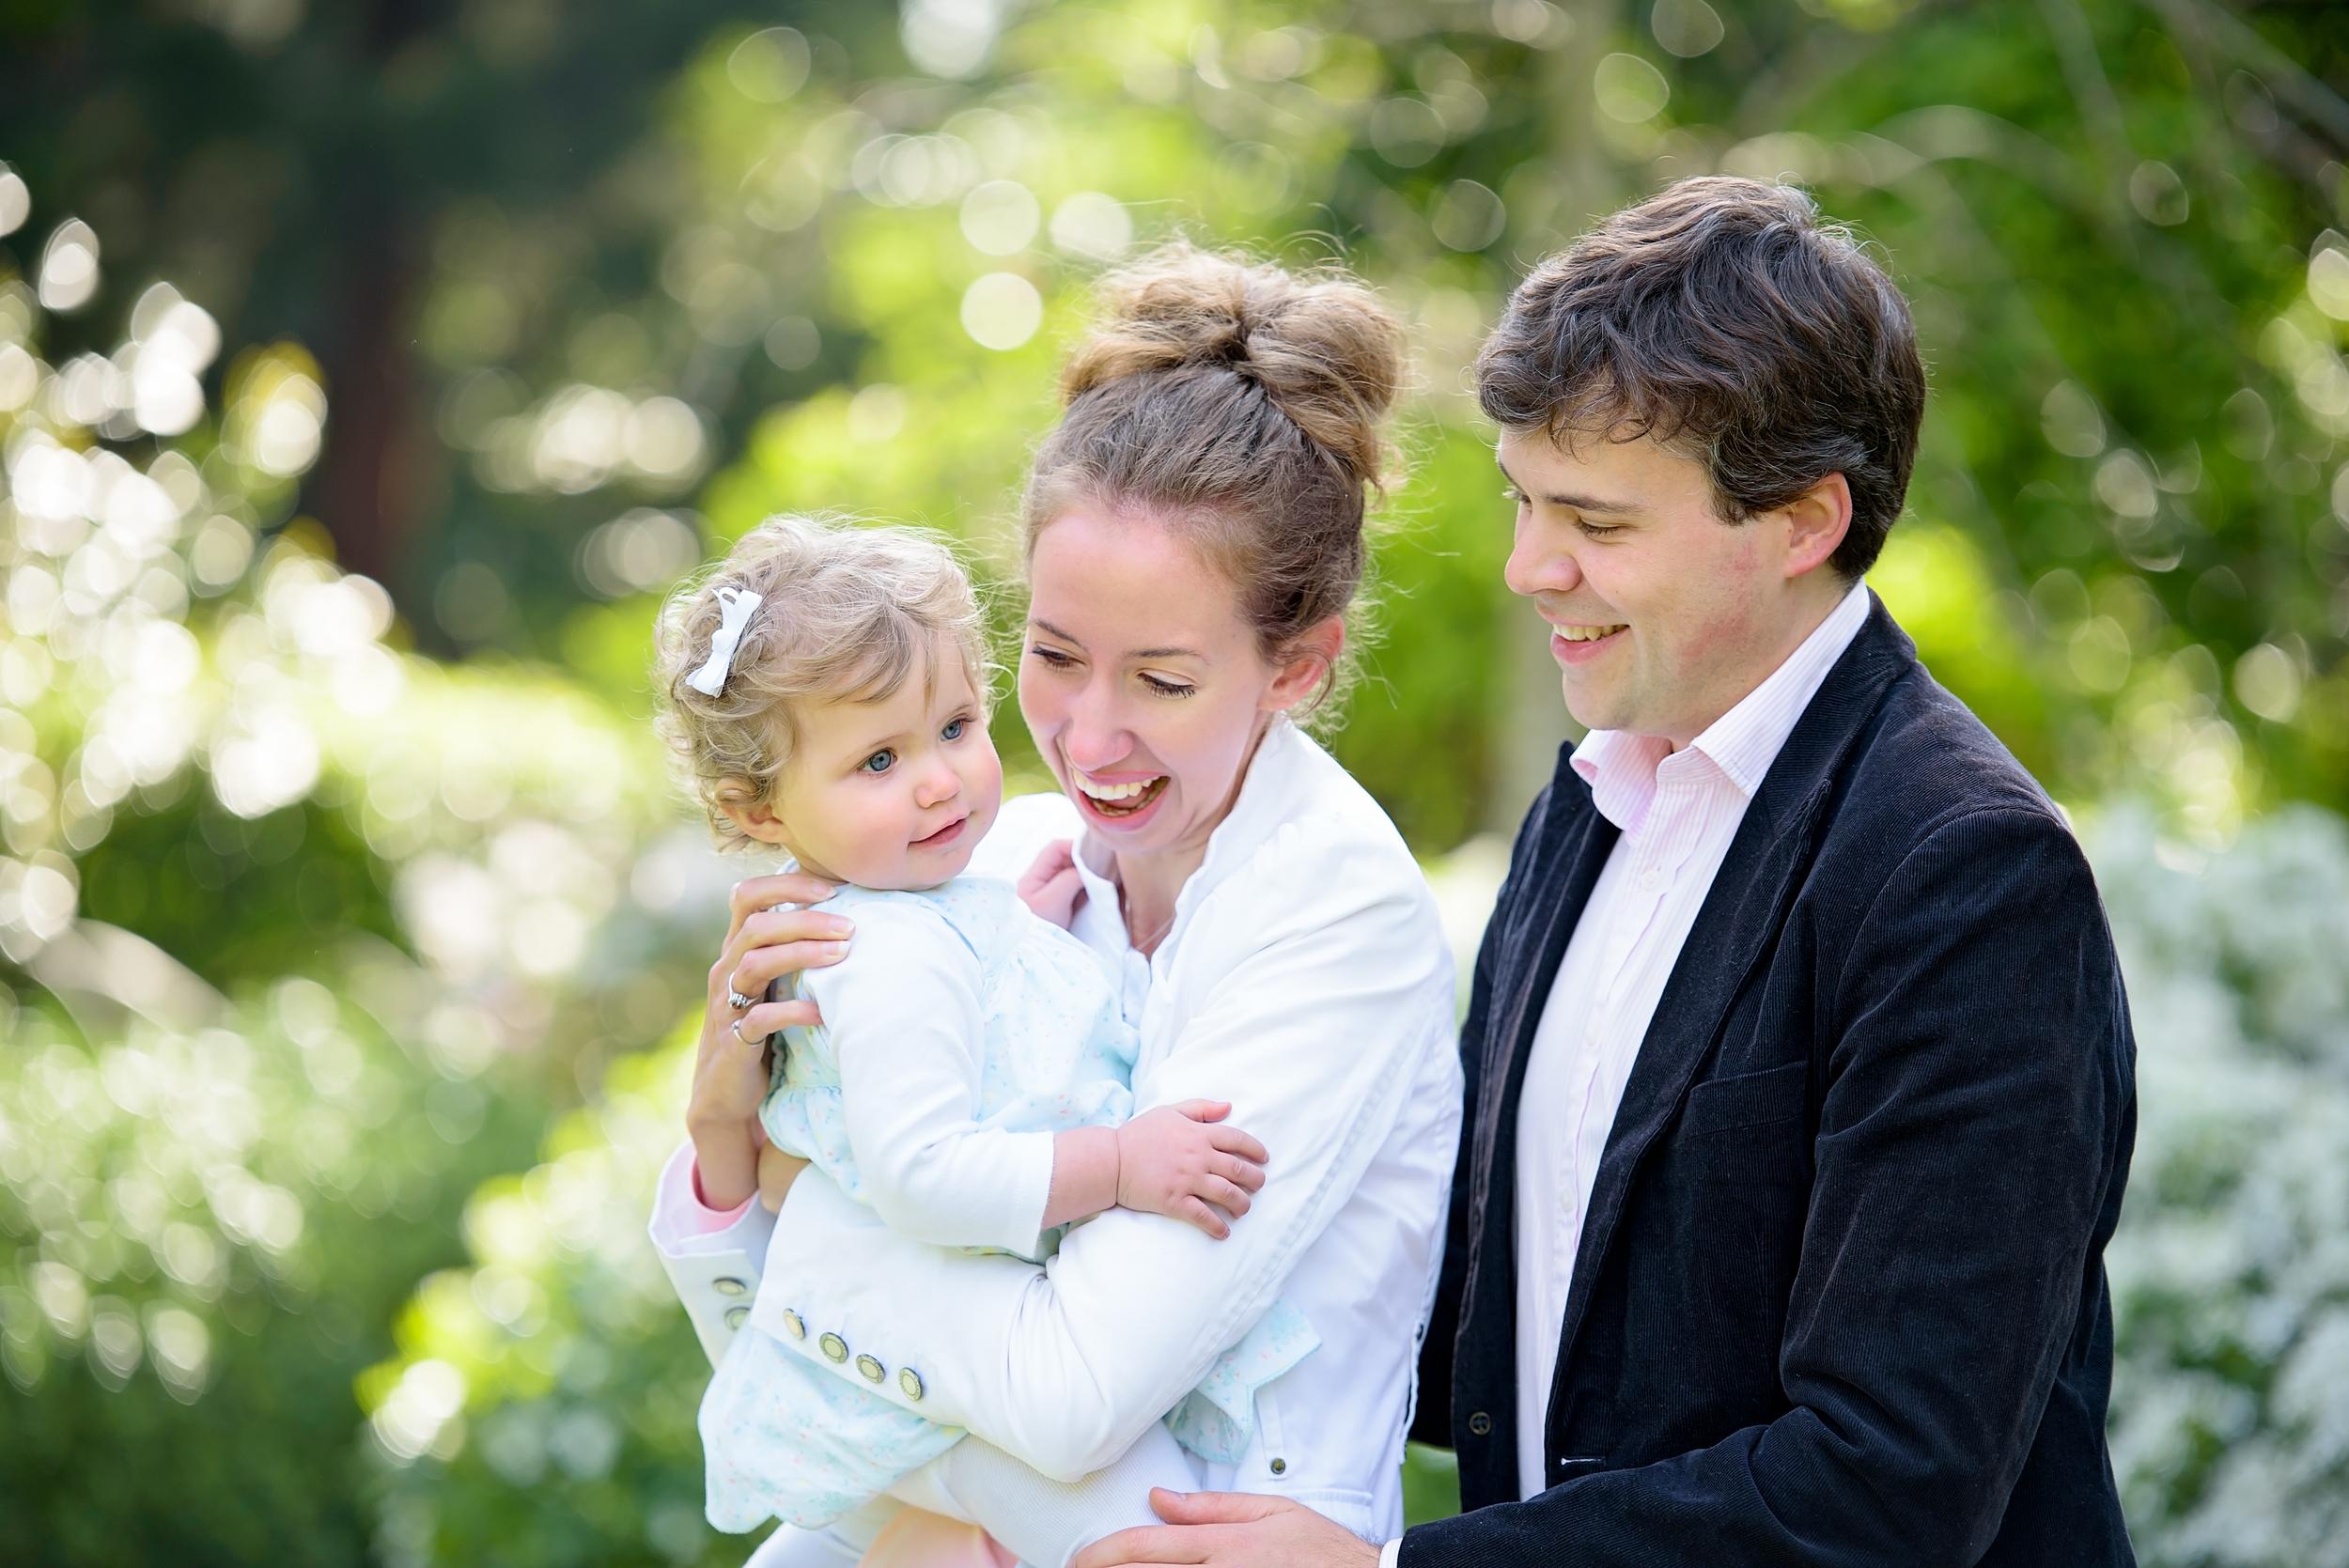 Family portrait photography, Holland Park